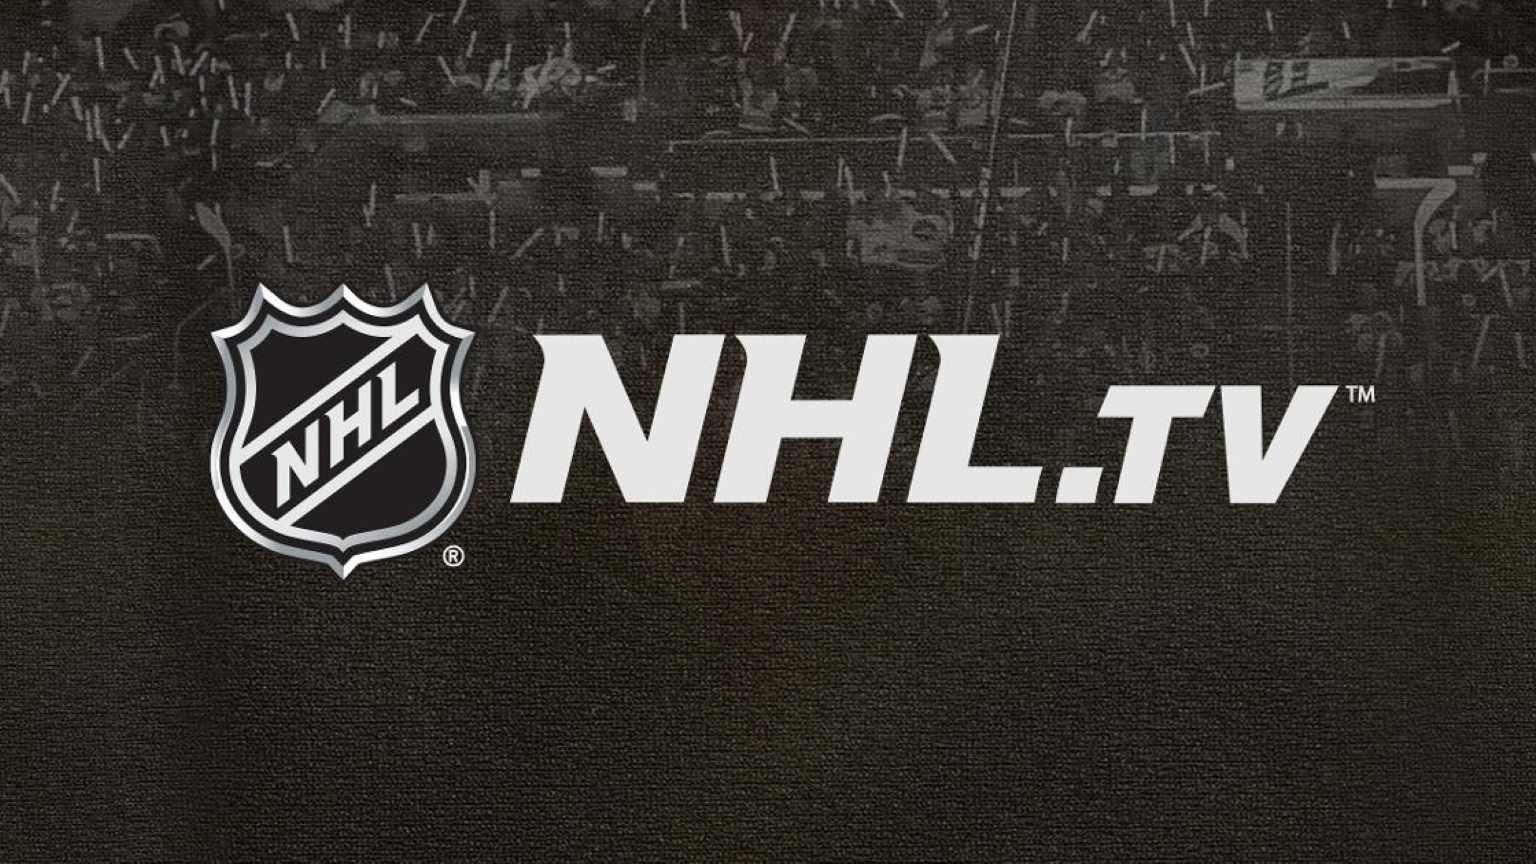 NHL.TV